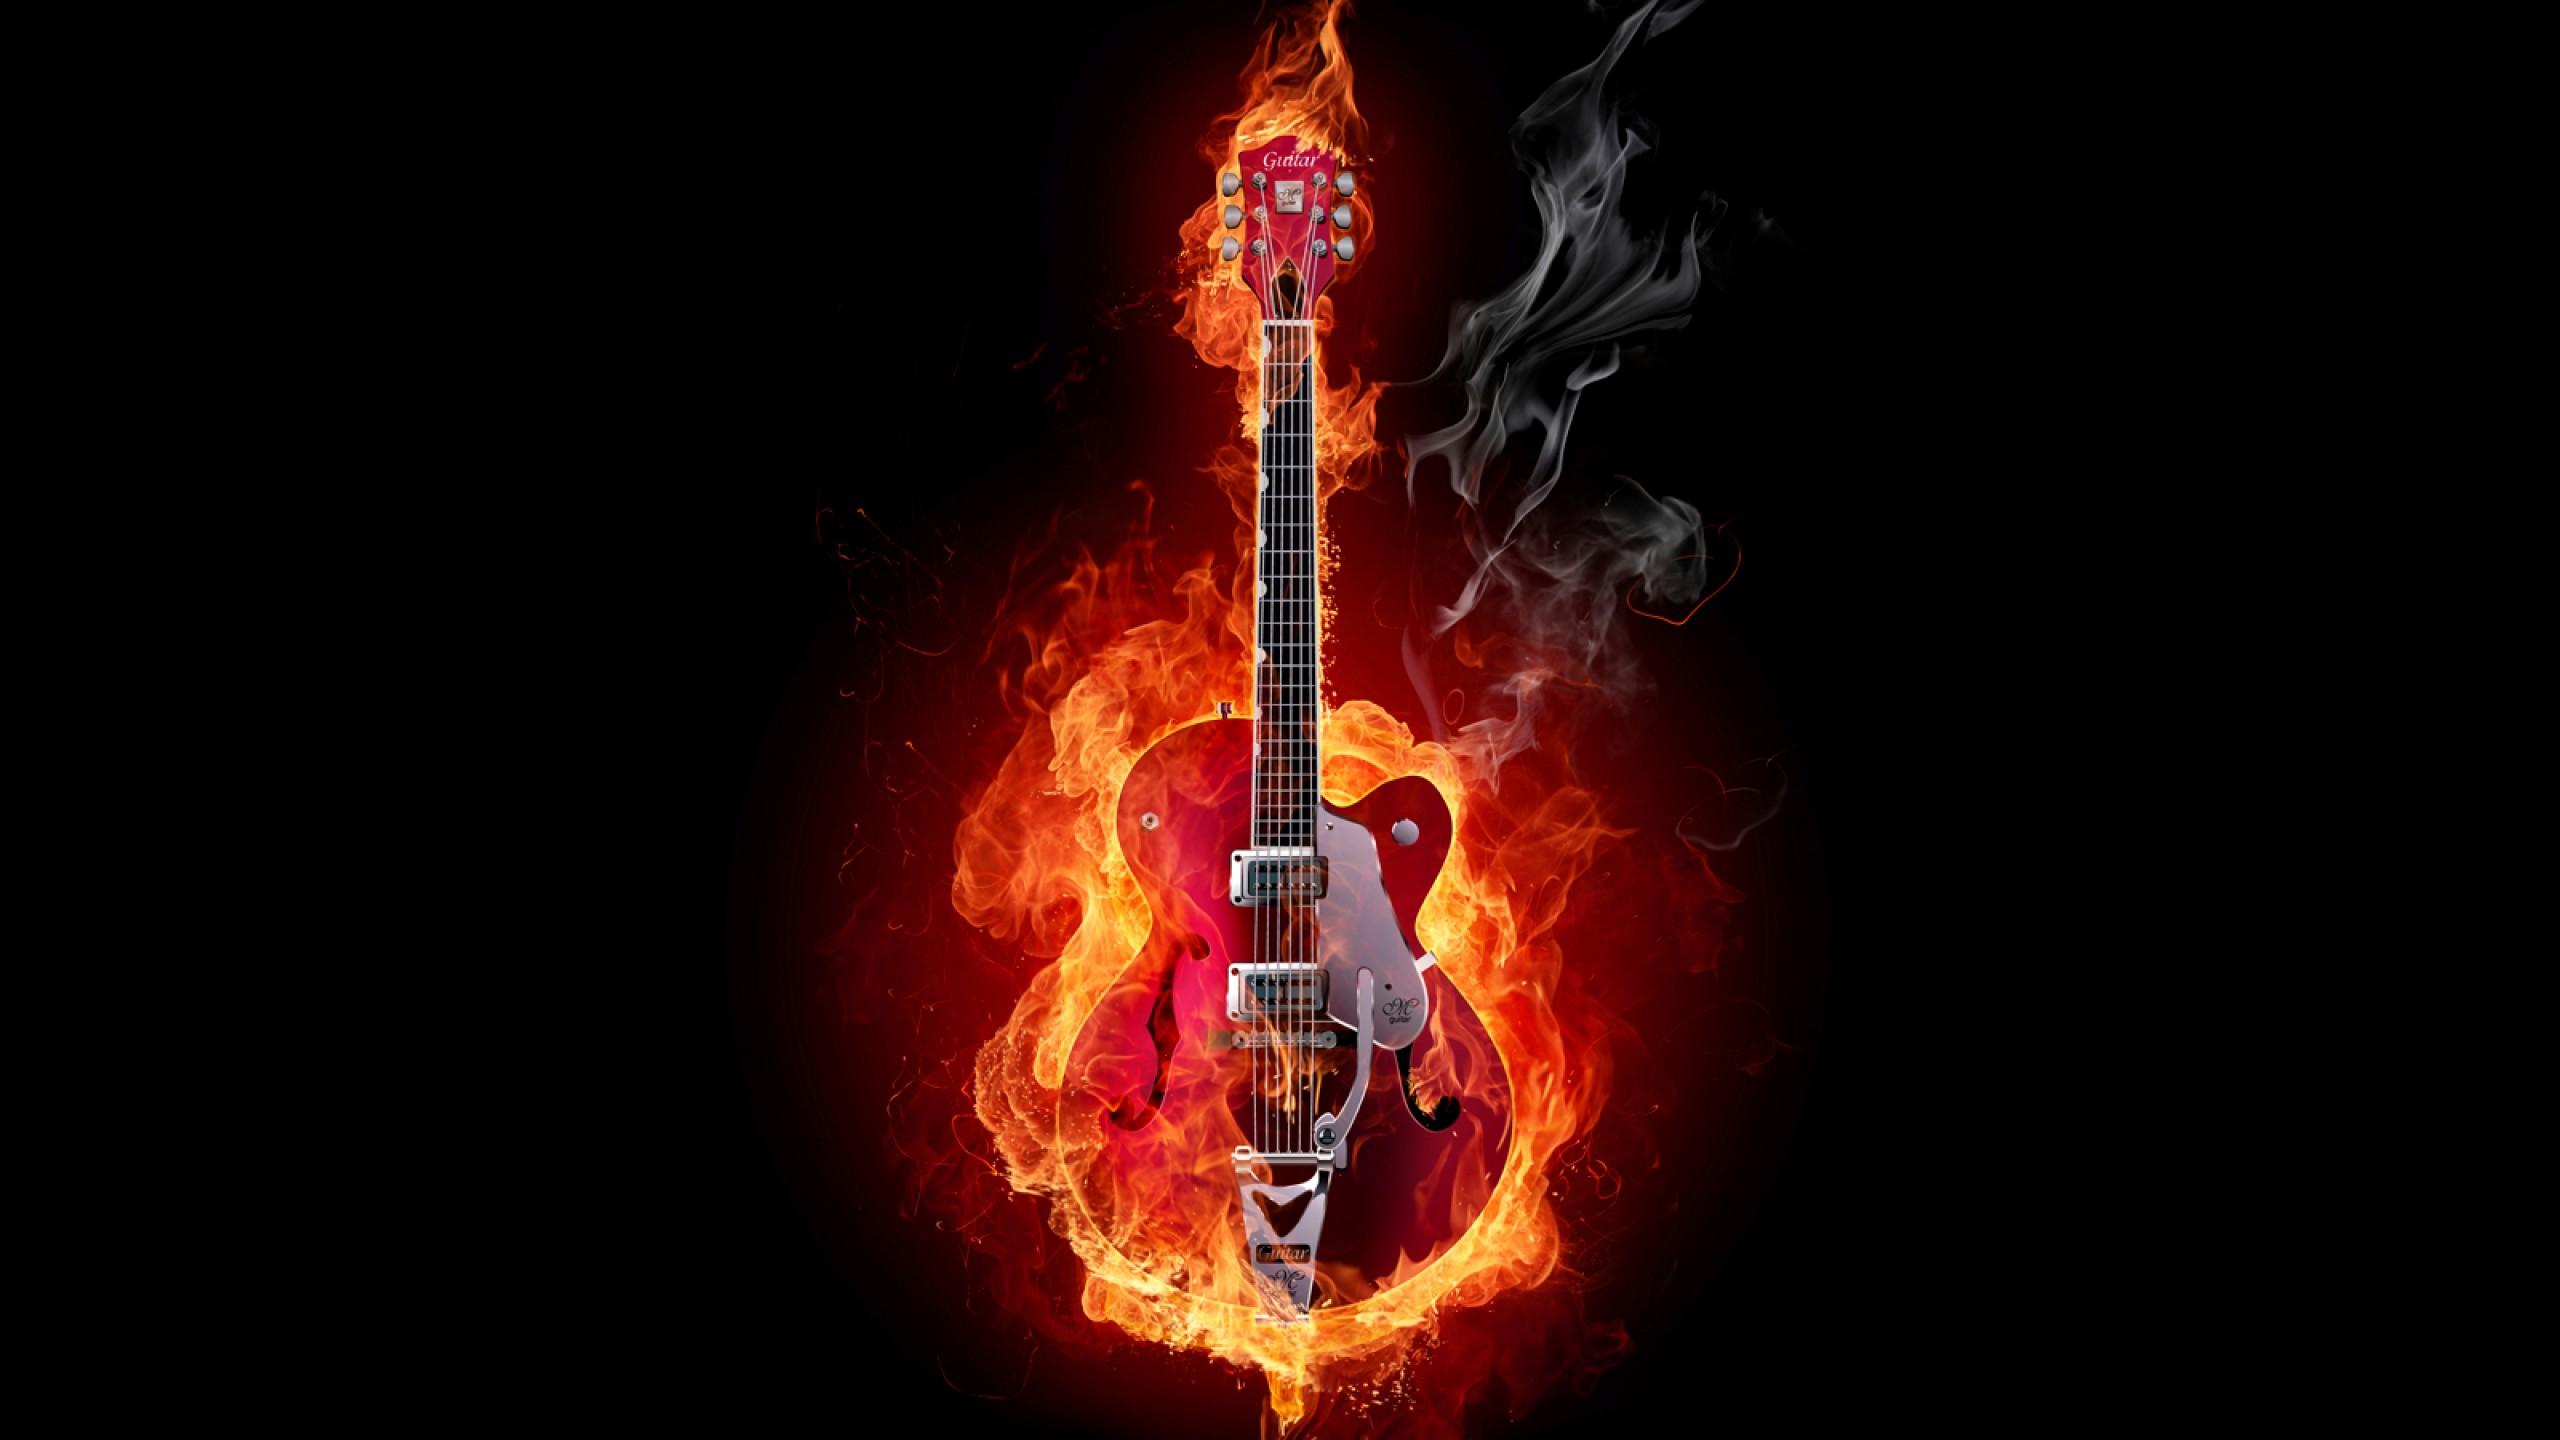 Jordan Carver Guitar Fire Best Flames Hd In 264399 Wallpaper wallpaper